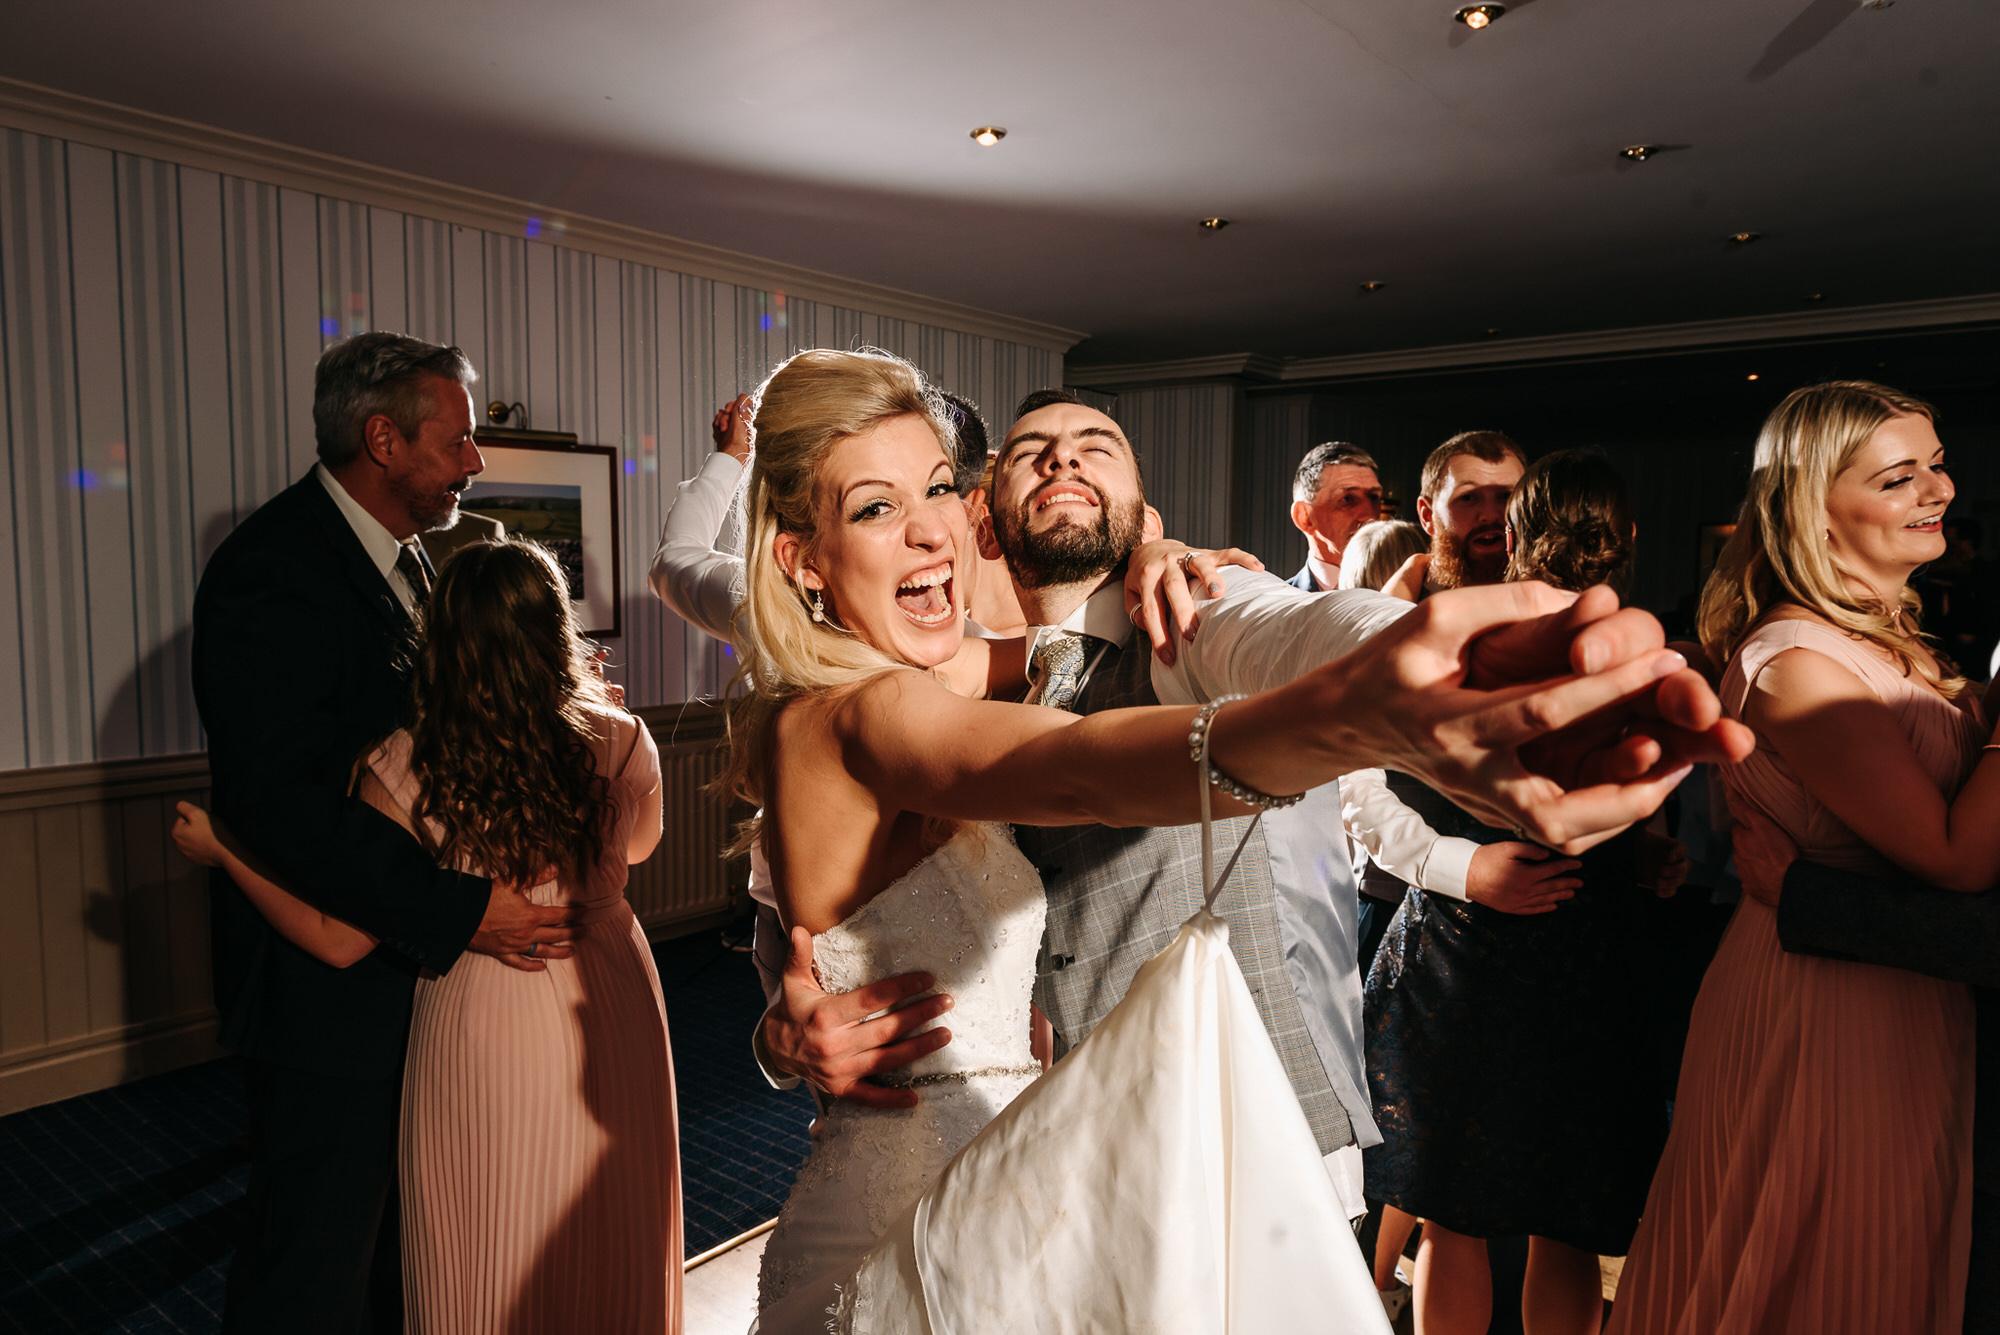 Best Of Yorkshire Wedding Photography 2017 - Martyn Hand-85.jpg